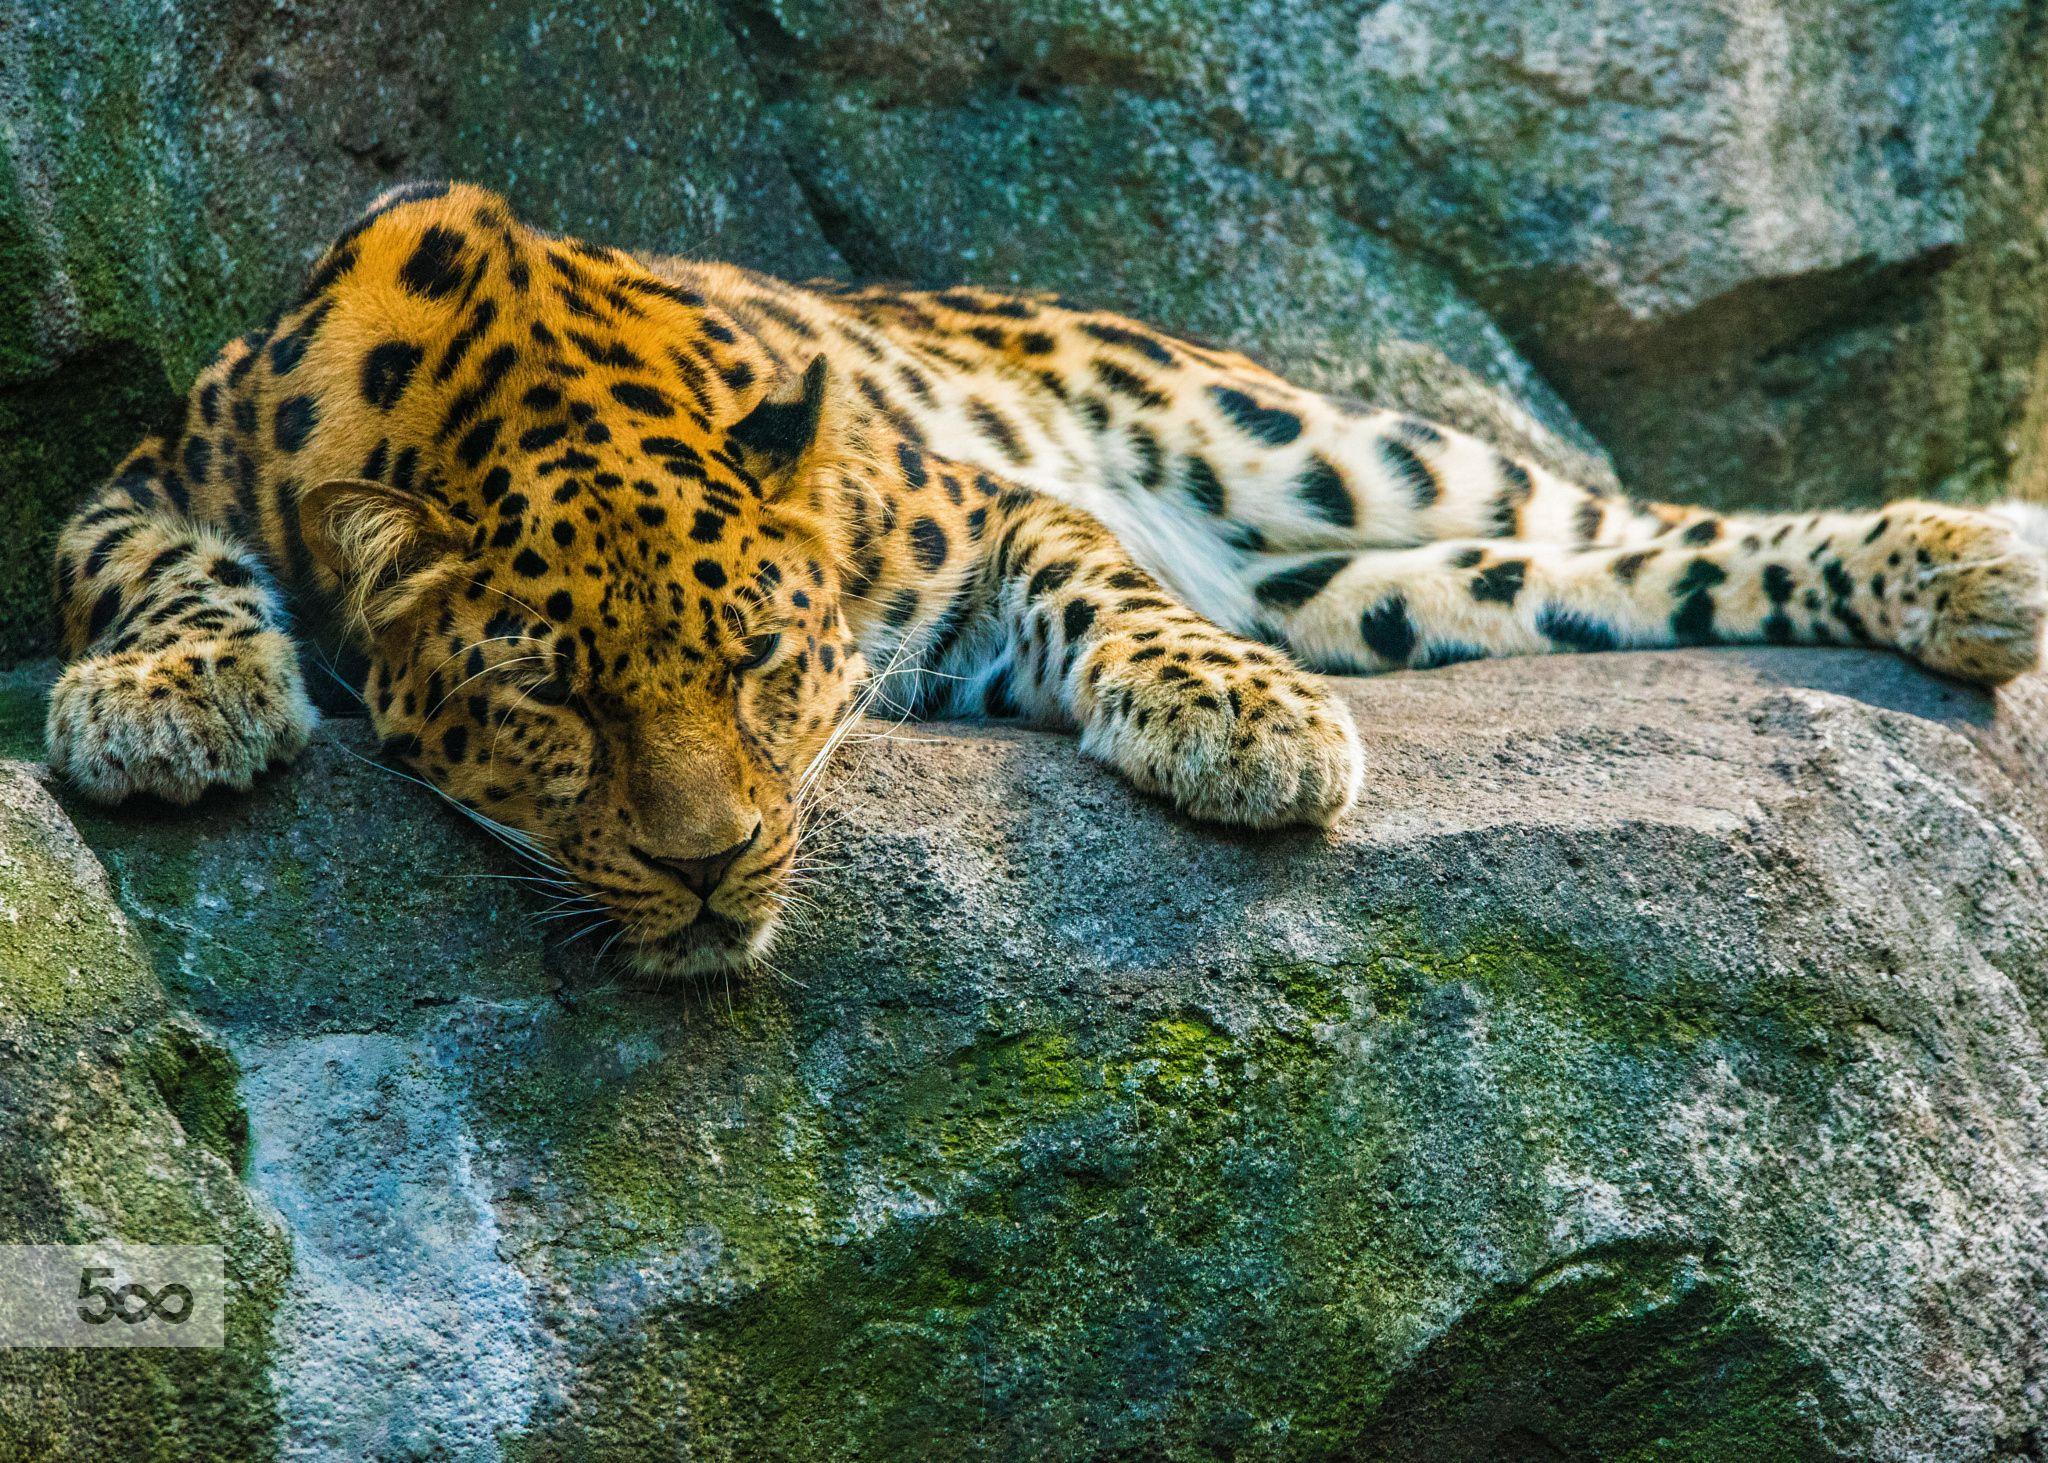 MNZOO leopard by Dustin Doust / 500px